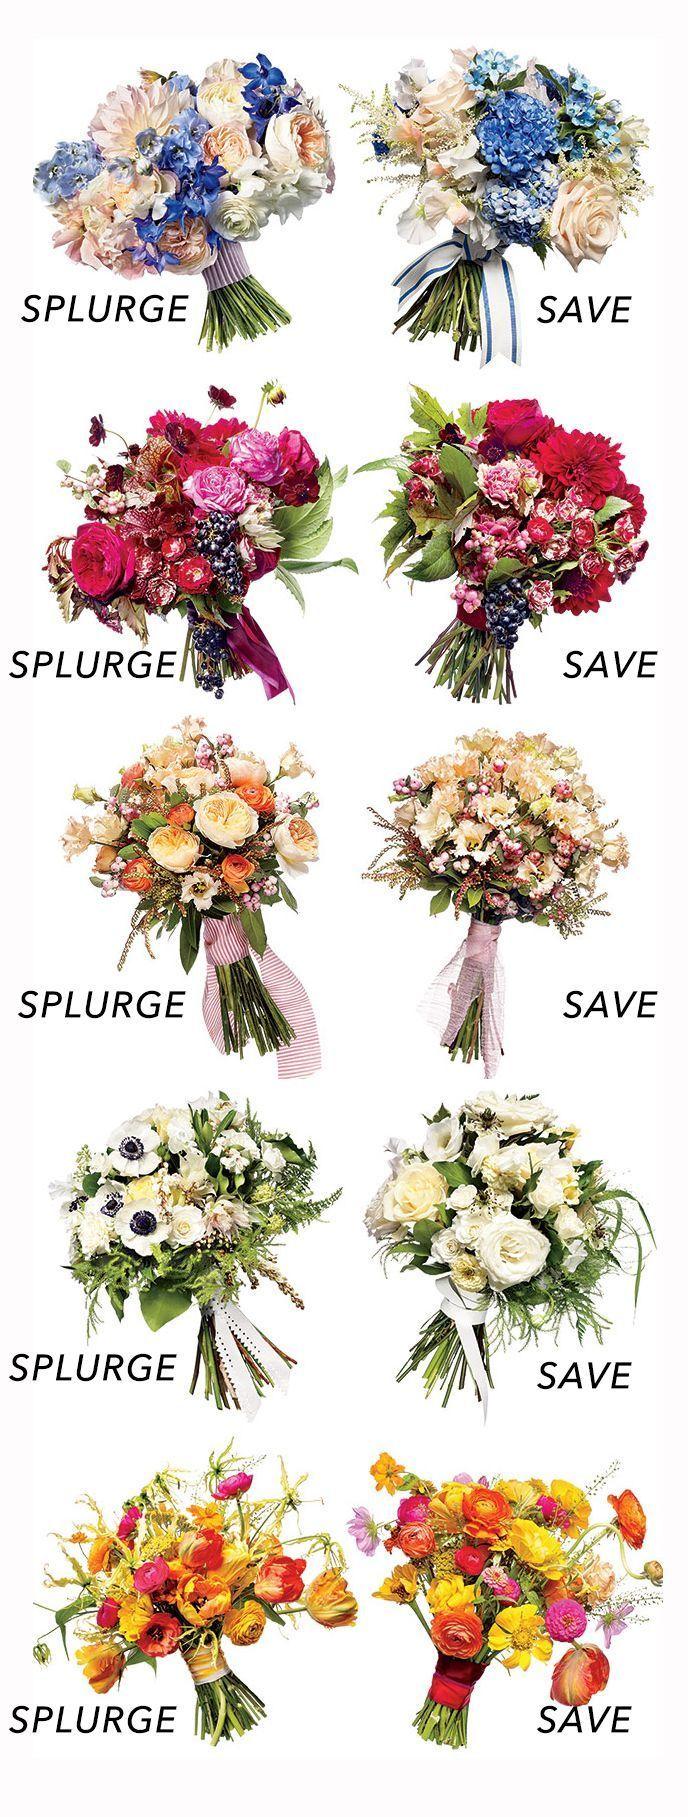 Save vs splurge wedding bouquets cheap wedding flowers flower splurge wedding bouquets cheap wedding flowers flower and weddings izmirmasajfo